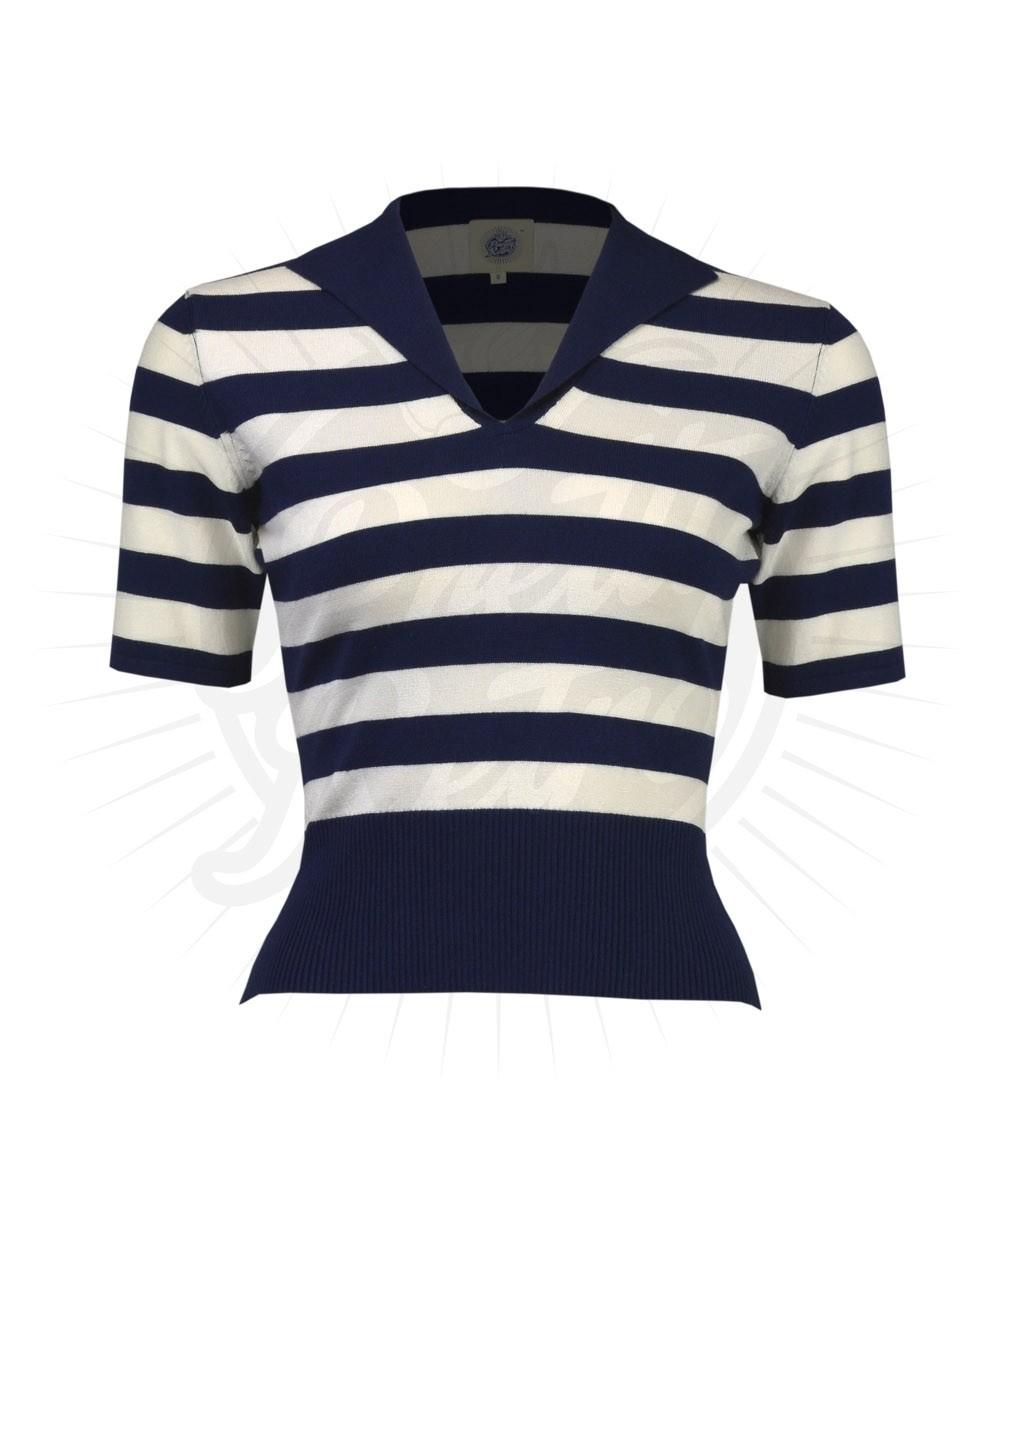 Trui Sweater.Sweater Trui Retro Blauw Wit Gestreept Online Kopen